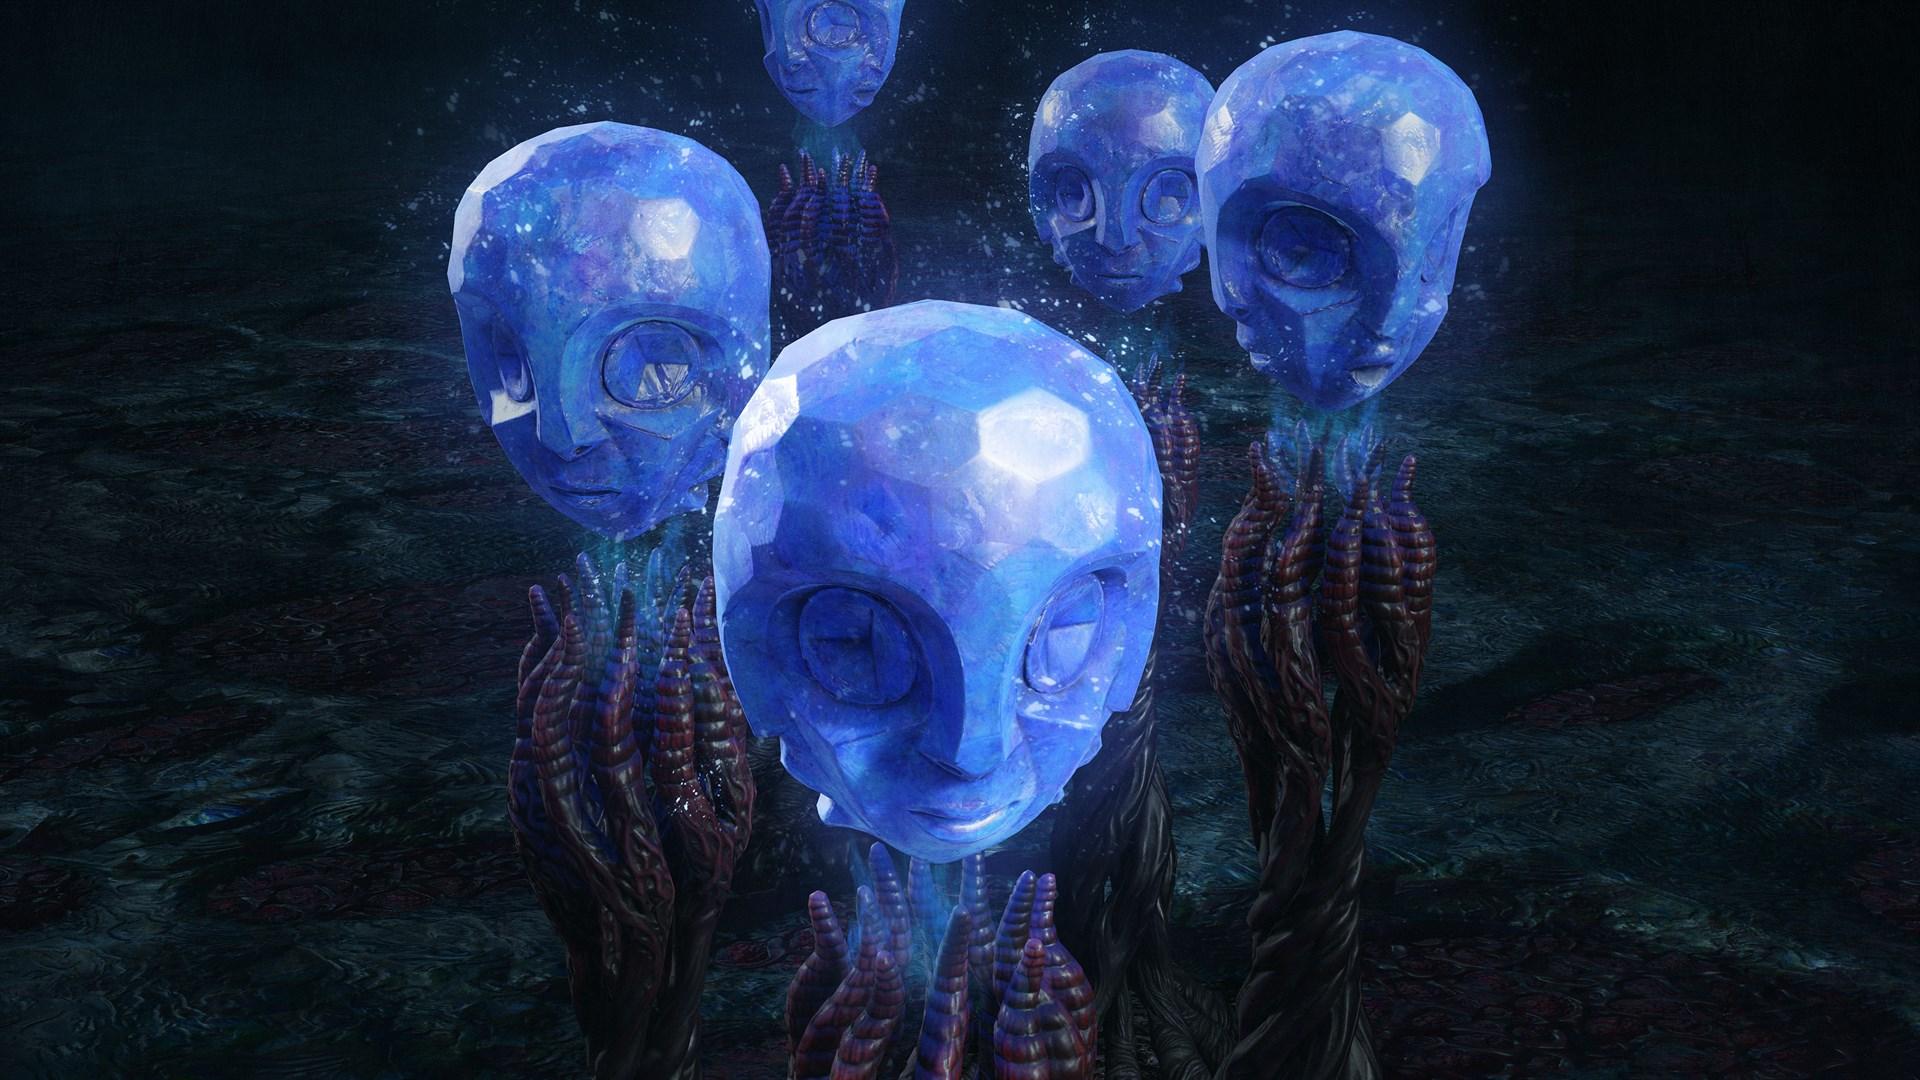 DMC5SE - 5 Blue Orbs